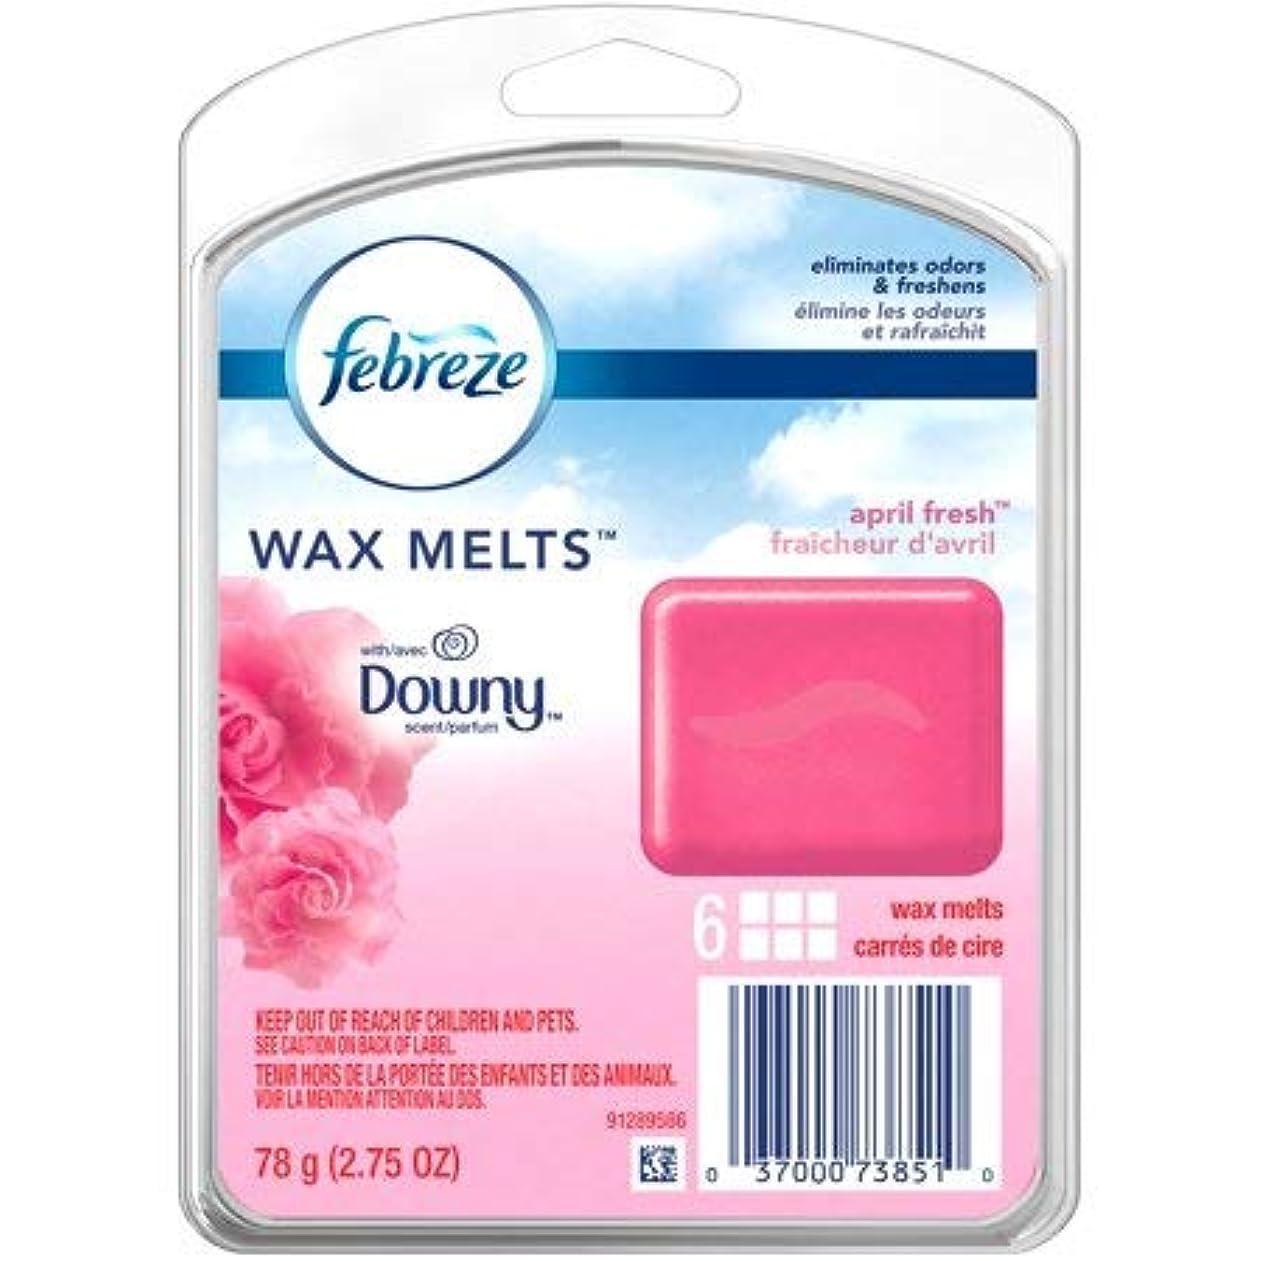 【Febreze/ファブリーズ】 ワックスメルト ダウニーエイプリルフレッシュ 6個入り Wax Melts Downy April Fresh Air Freshener (78 g / 2.75 oz)